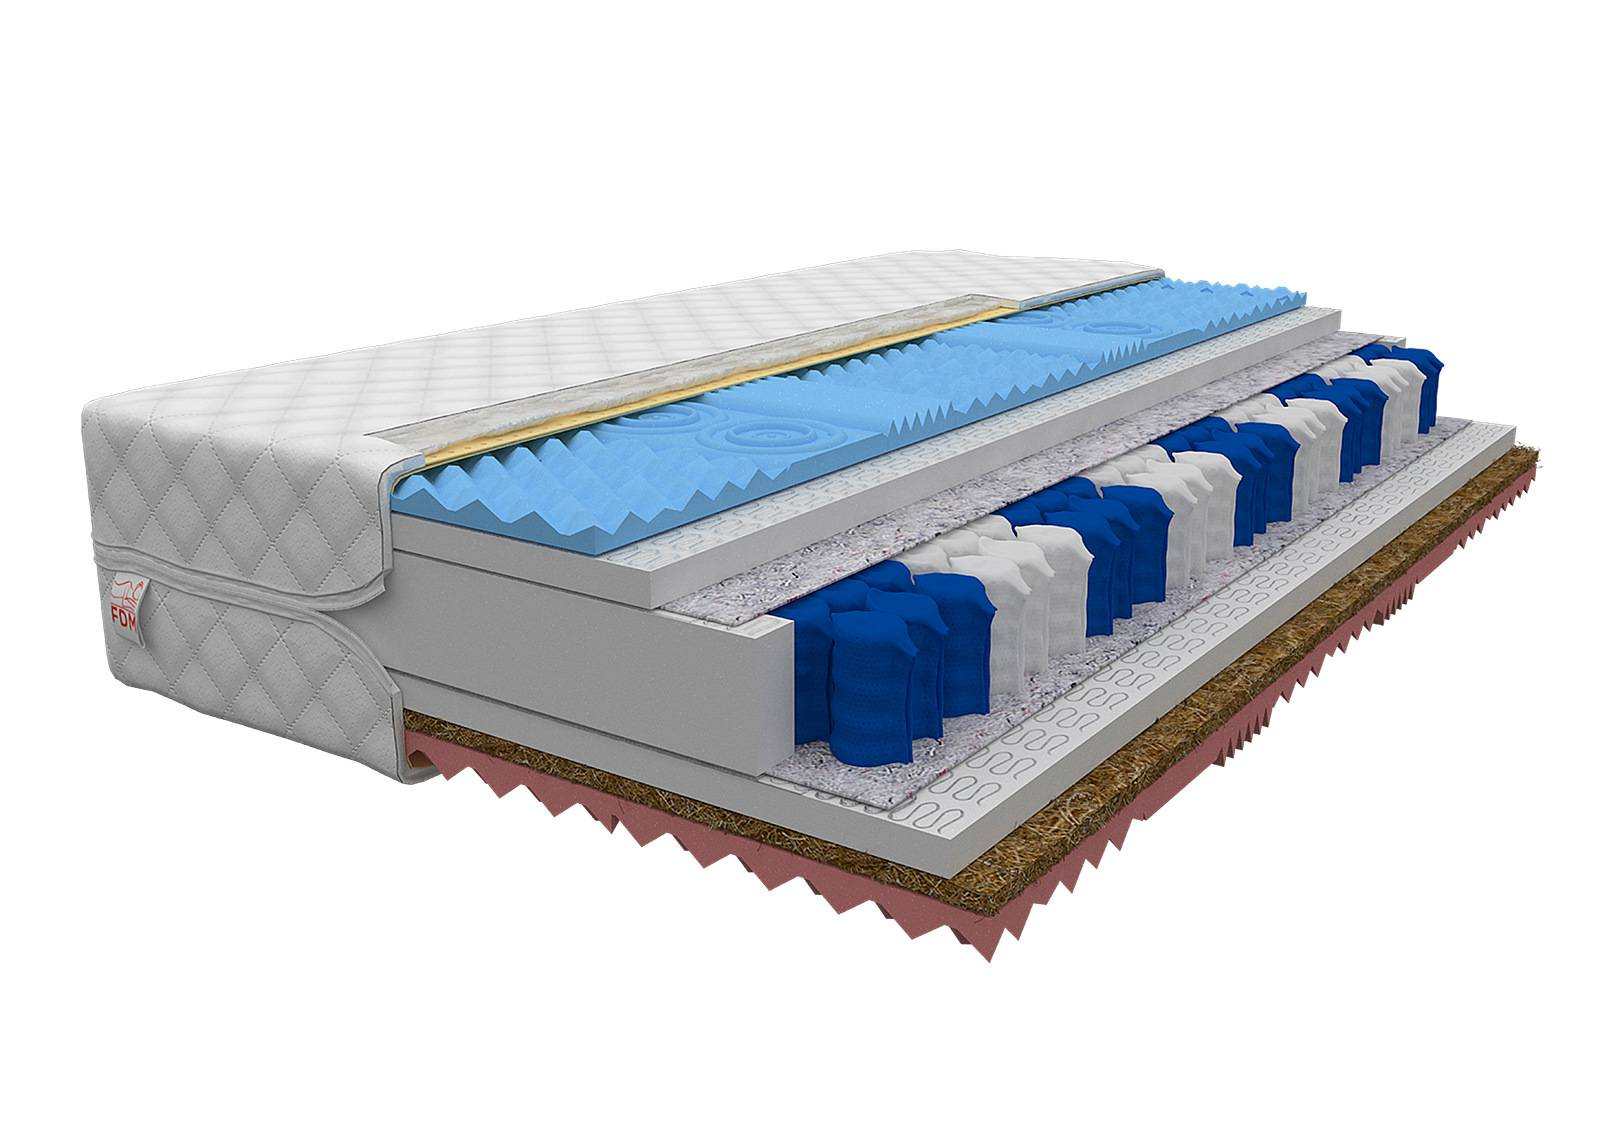 Image of FDM Joustinpatja Ginaso Pocket 160x200 cm